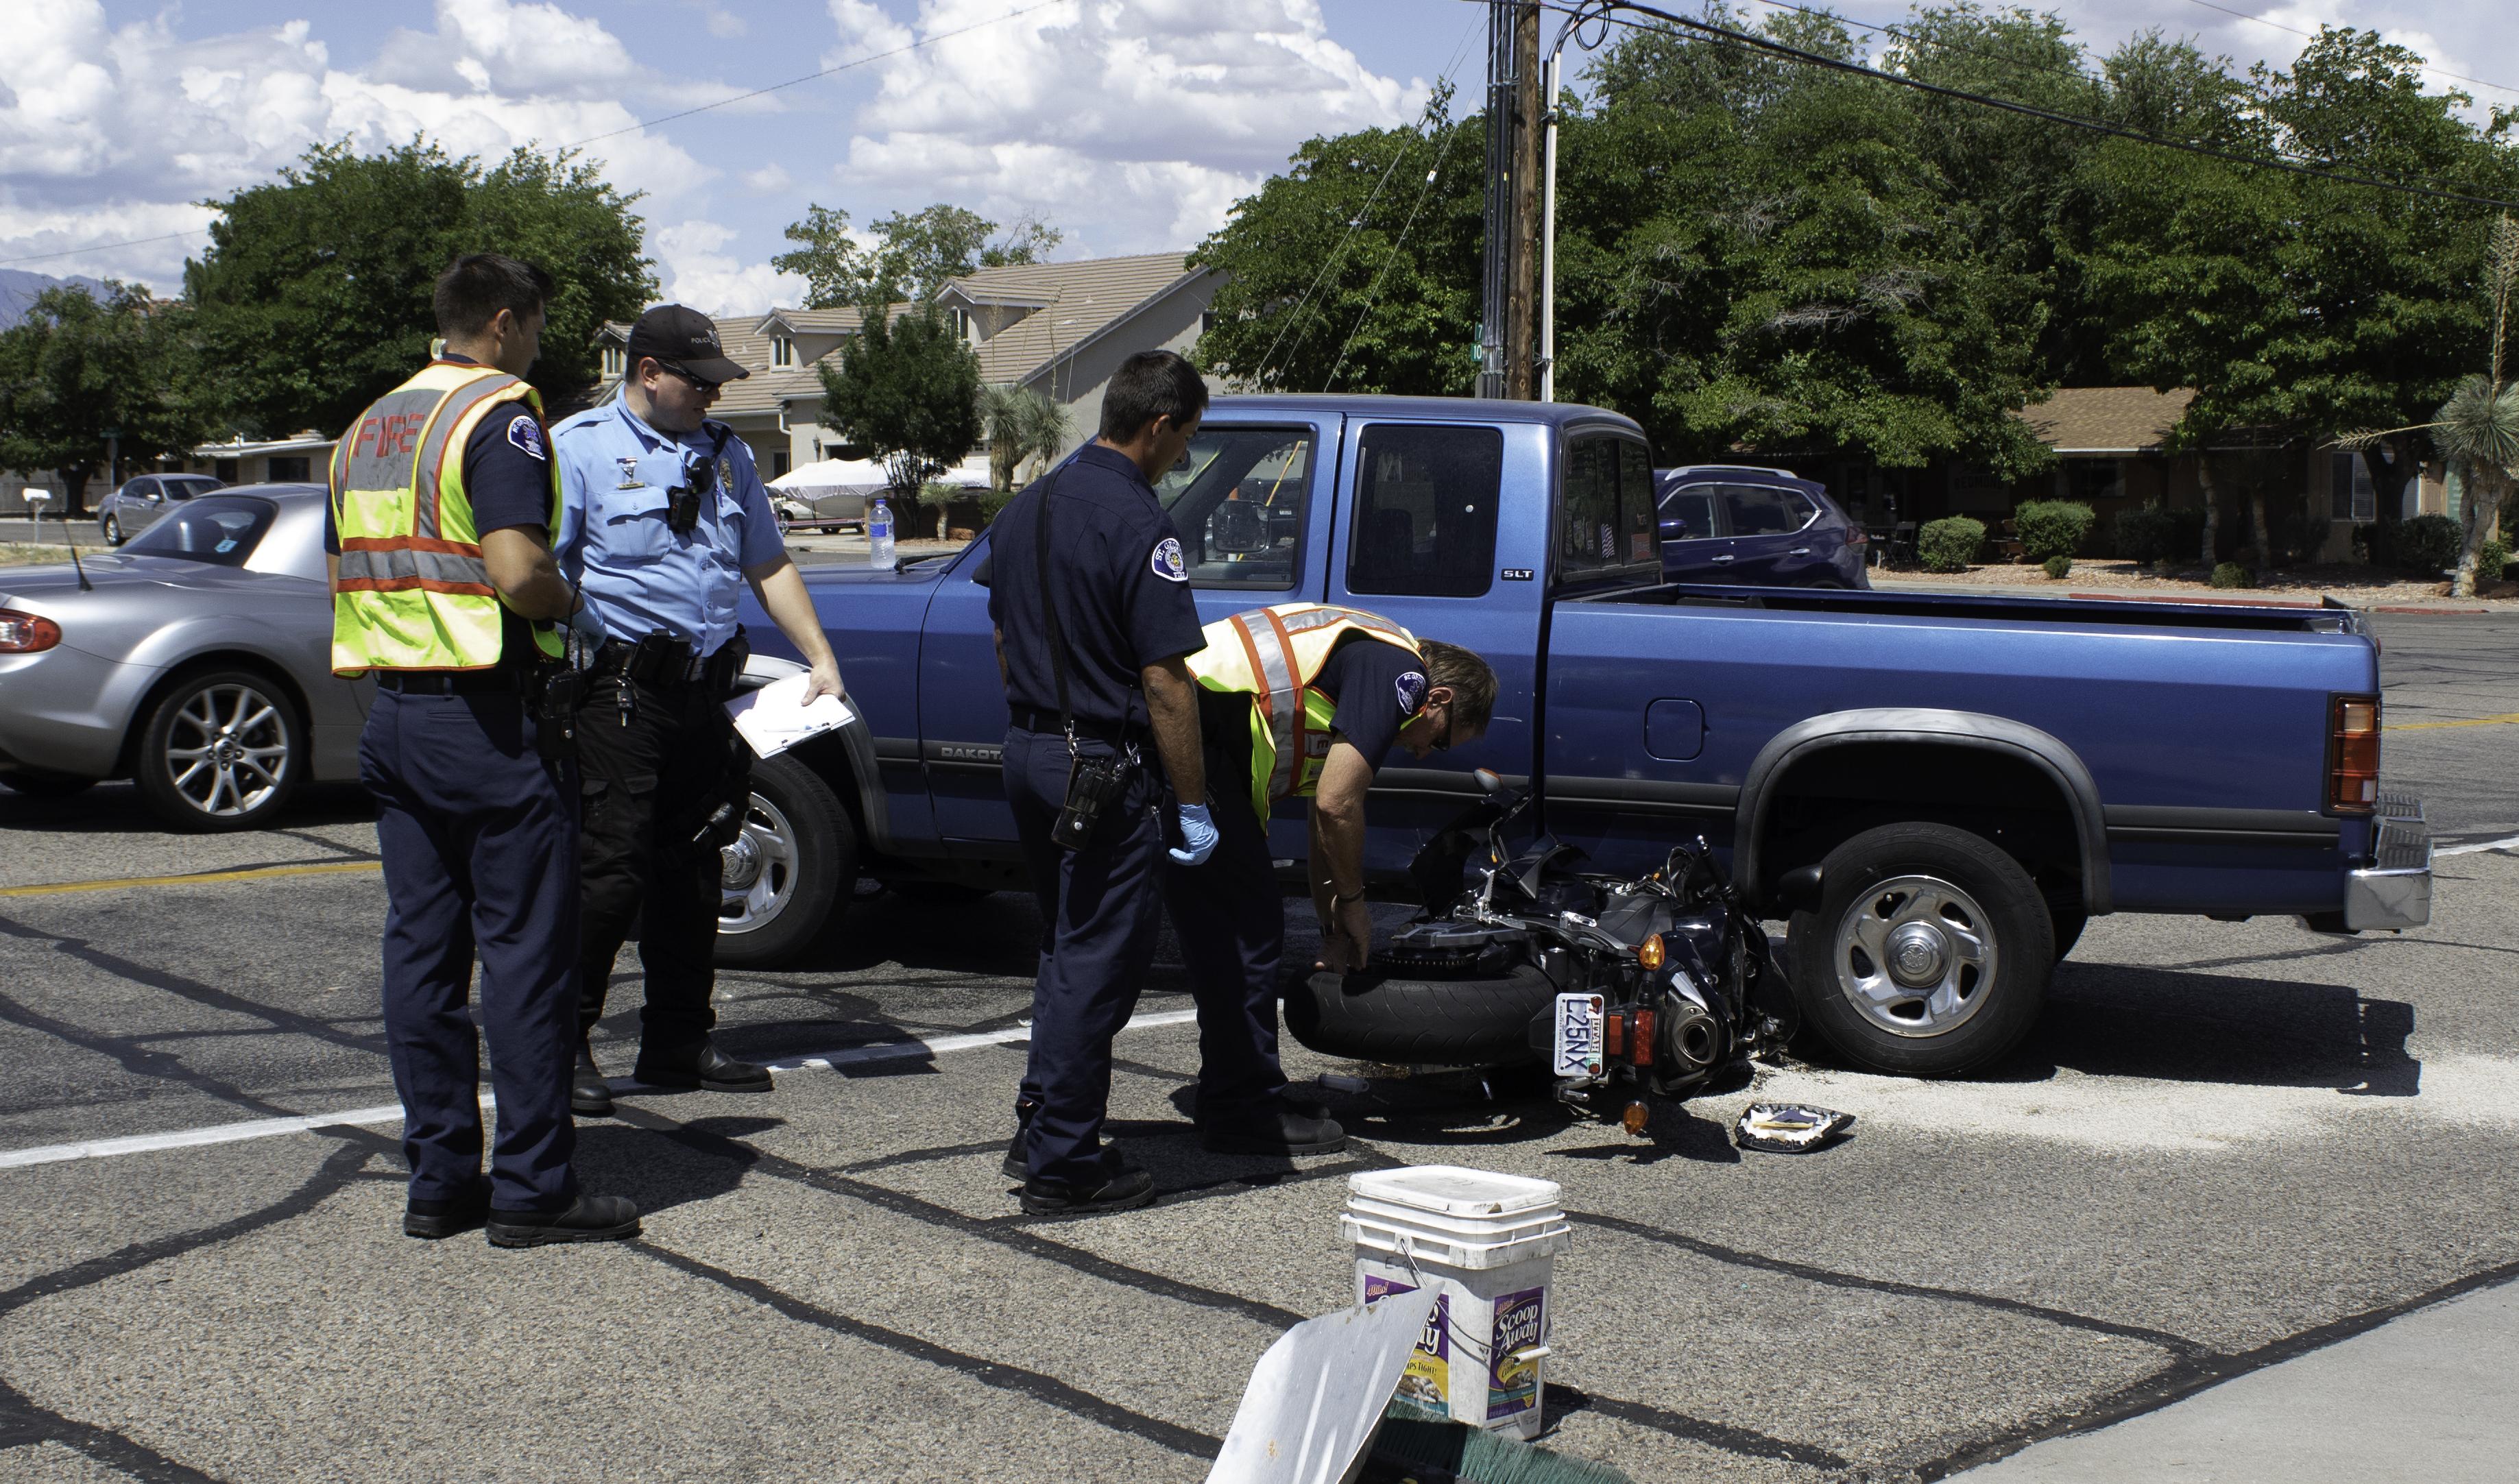 Motorcycle wedged under truck after crash near Bluff Street